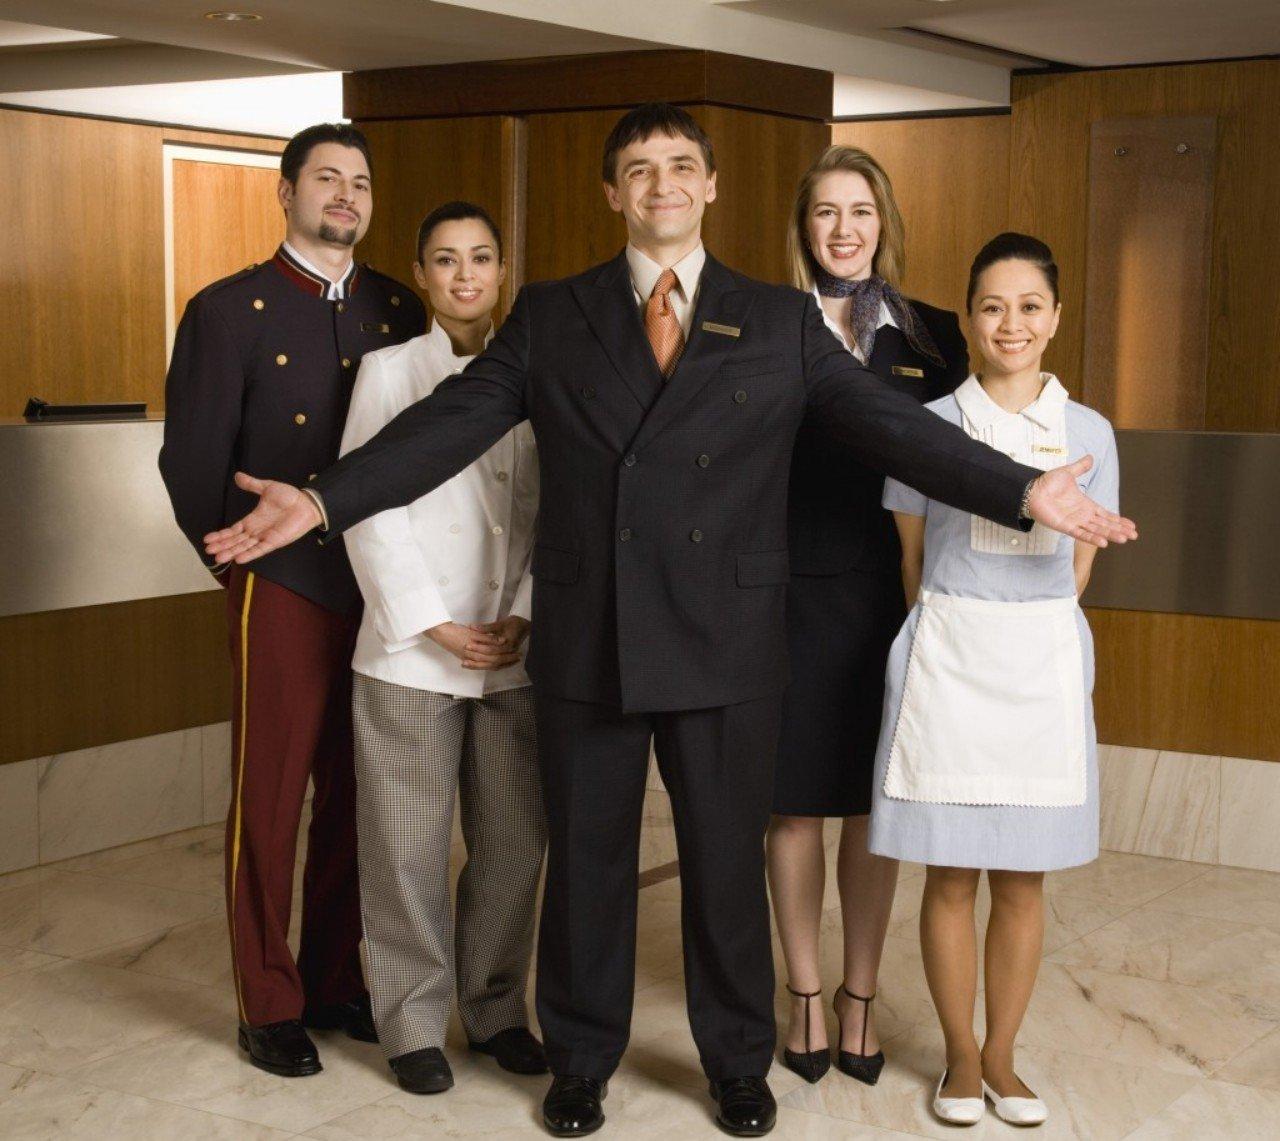 hotel-staff-1024x1024